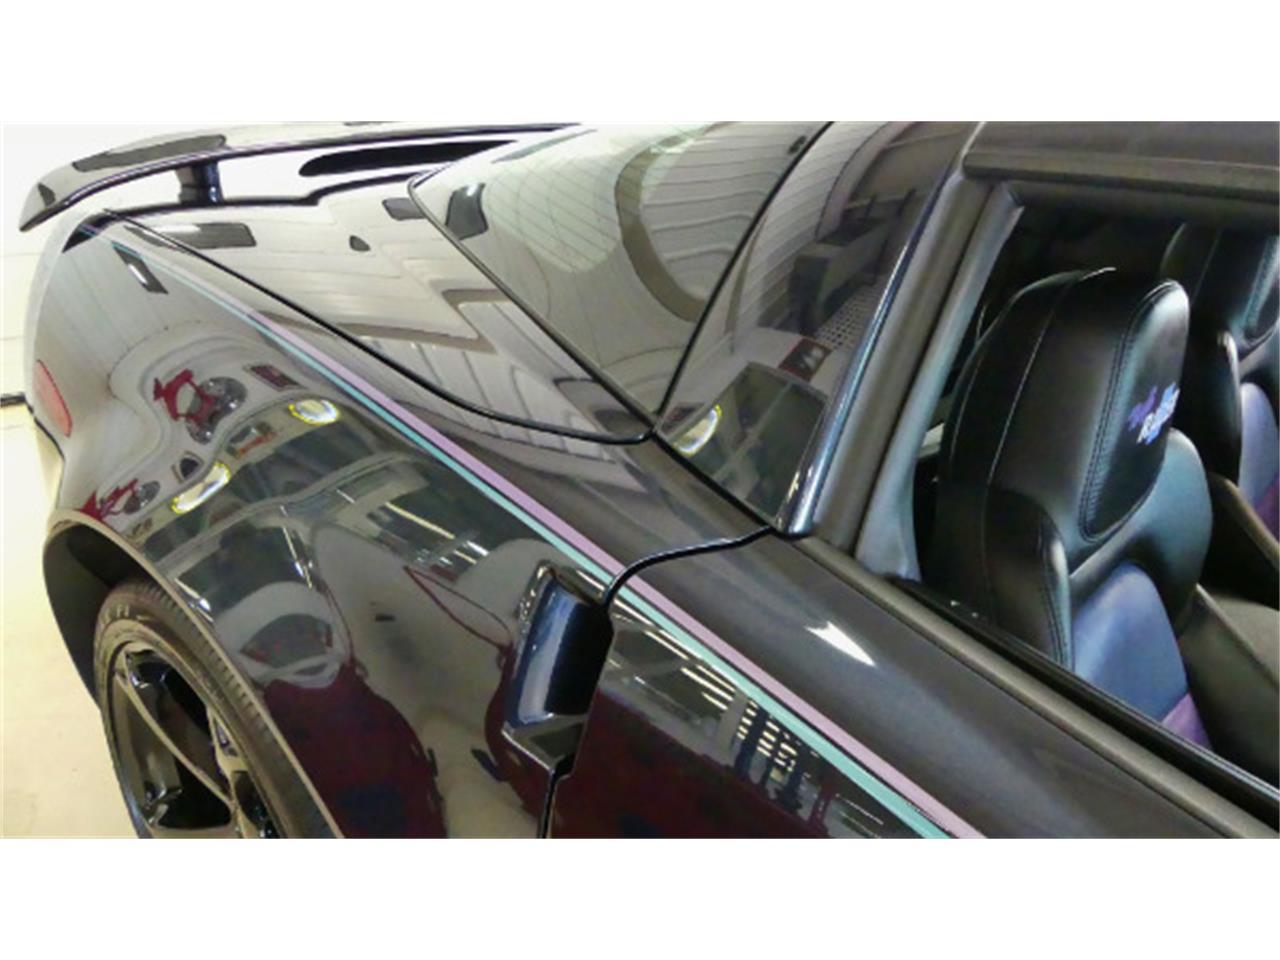 Large Picture of '13 Chevrolet Corvette located in Columbus Ohio - $45,895.00 - L3E0